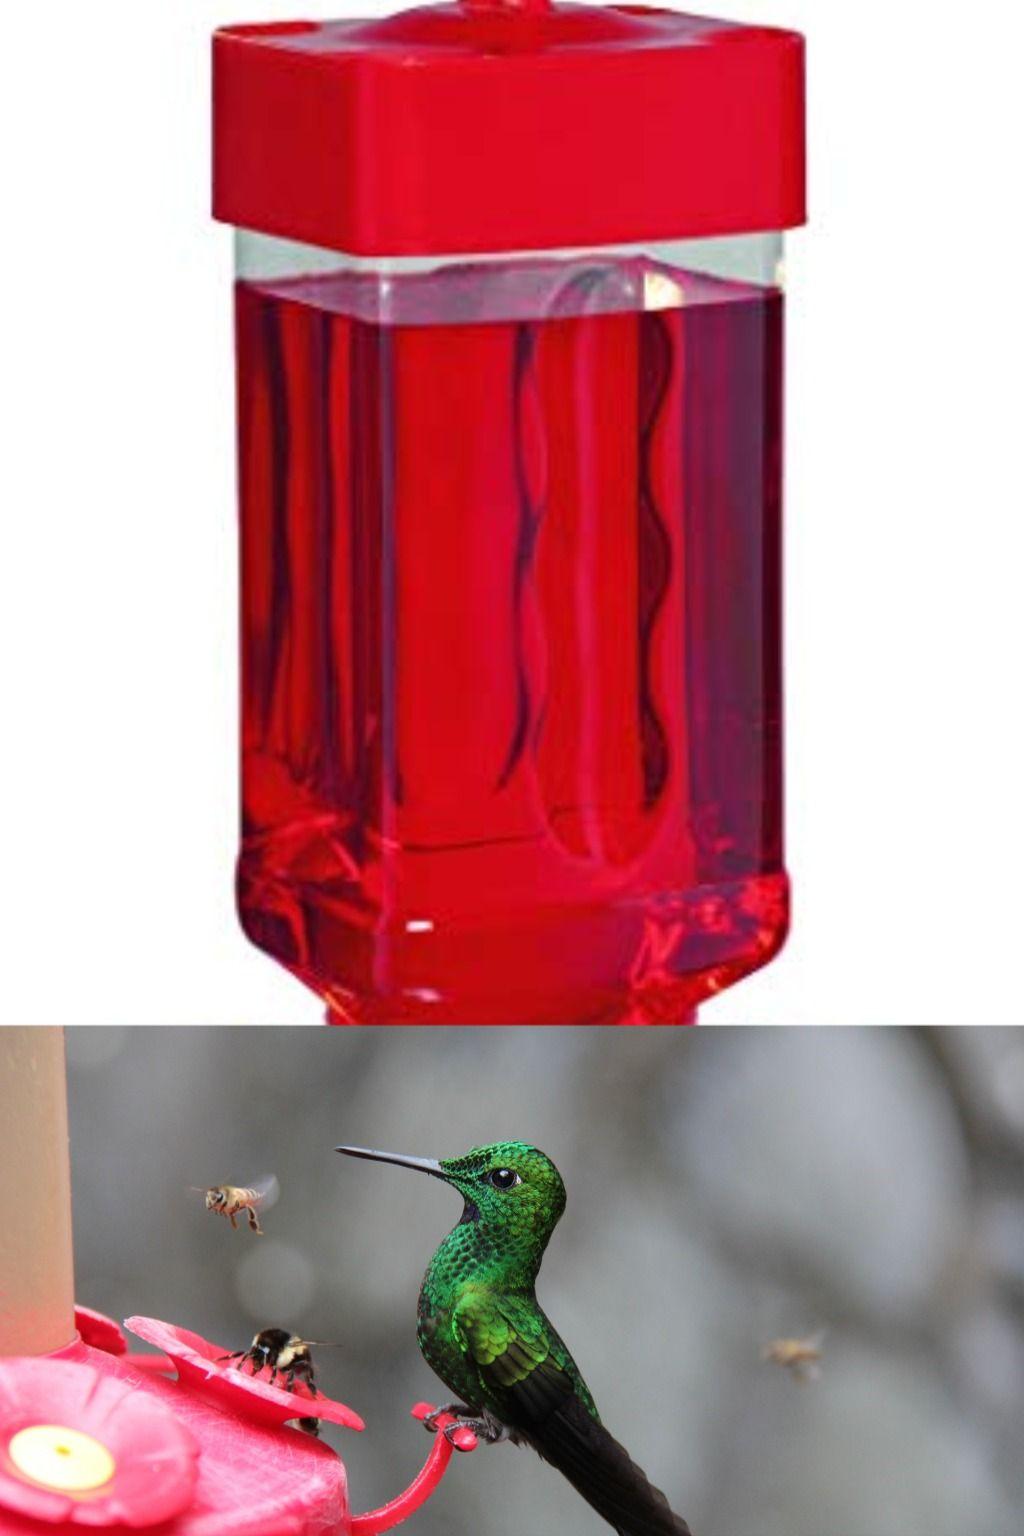 The Best Hummingbird Feeder Top 5 Reviews And Buying Guide In 2020 Humming Bird Feeders Bird Photography Bird Species